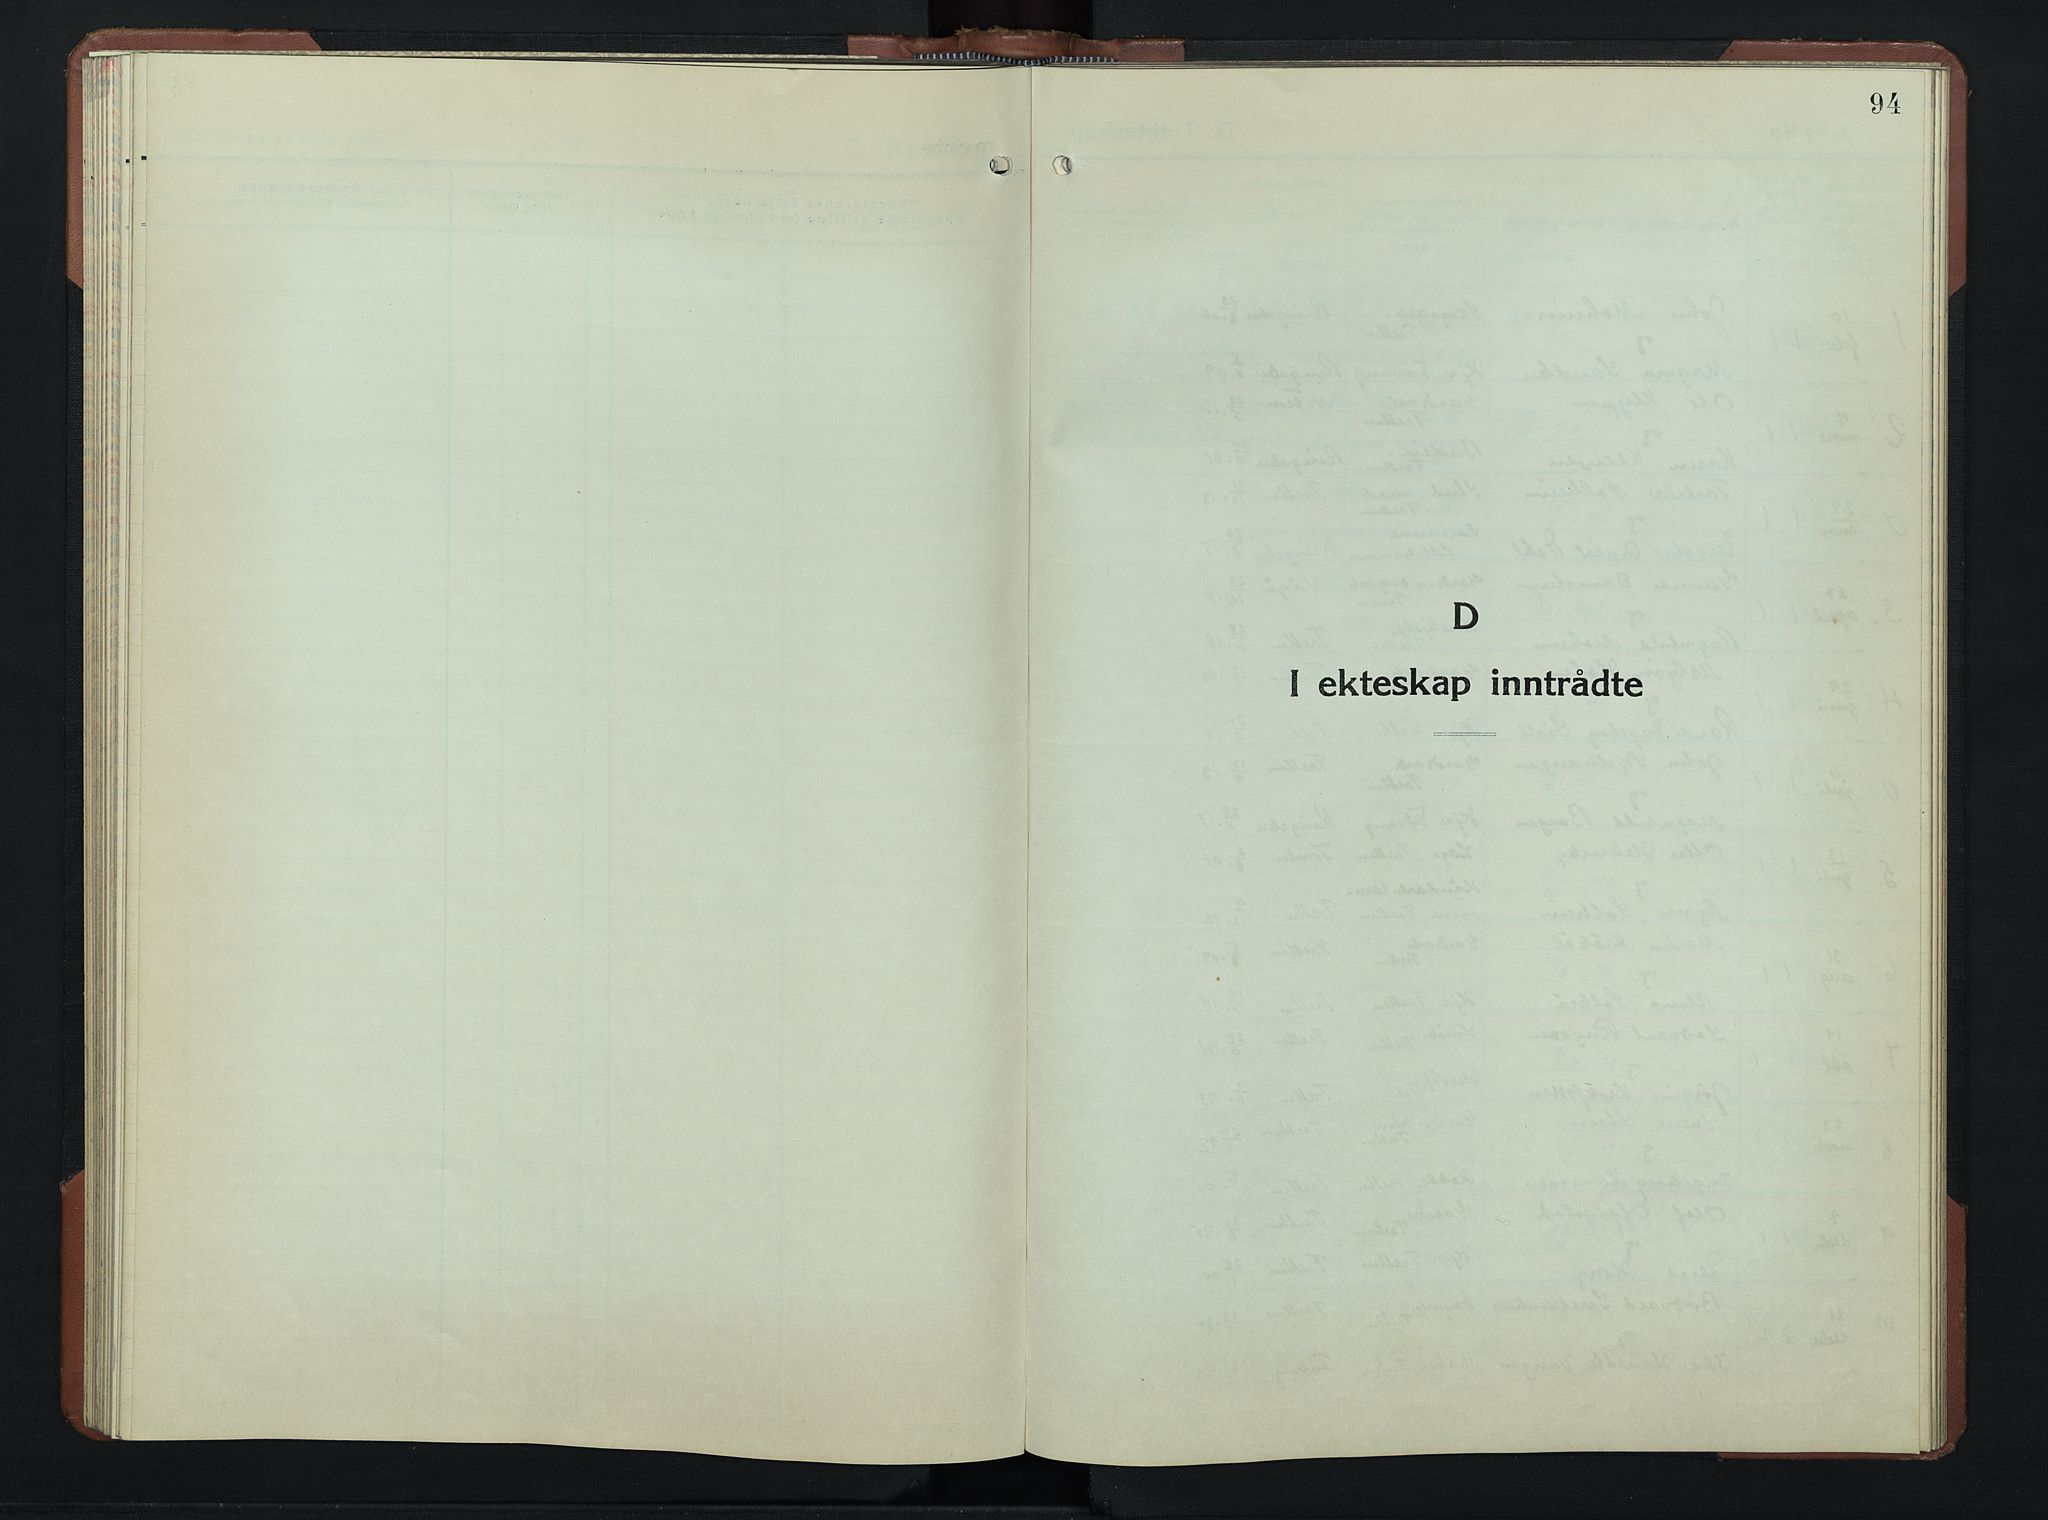 SAH, Øyer prestekontor, Klokkerbok nr. 9, 1939-1953, s. 94